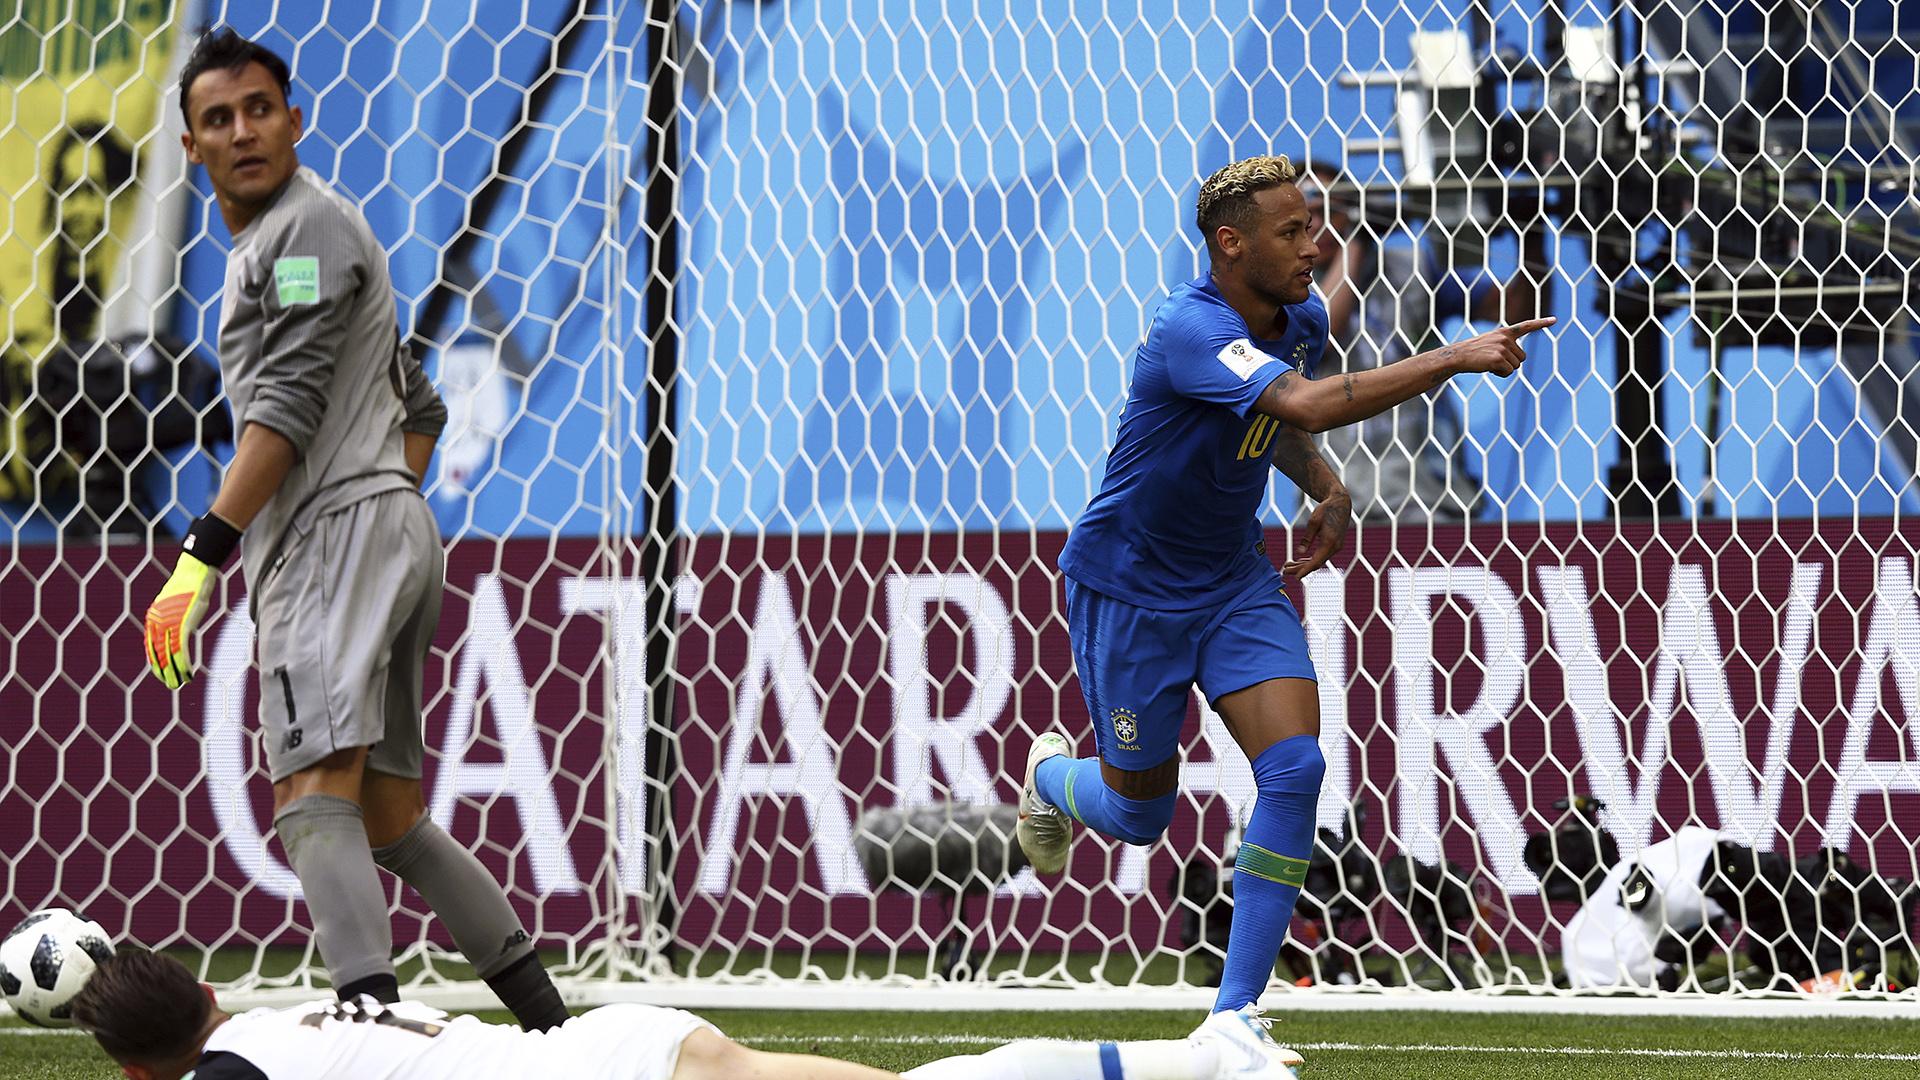 Navas e Neymar Brasil x Costa Rica Copa do Mundo 22 06 18